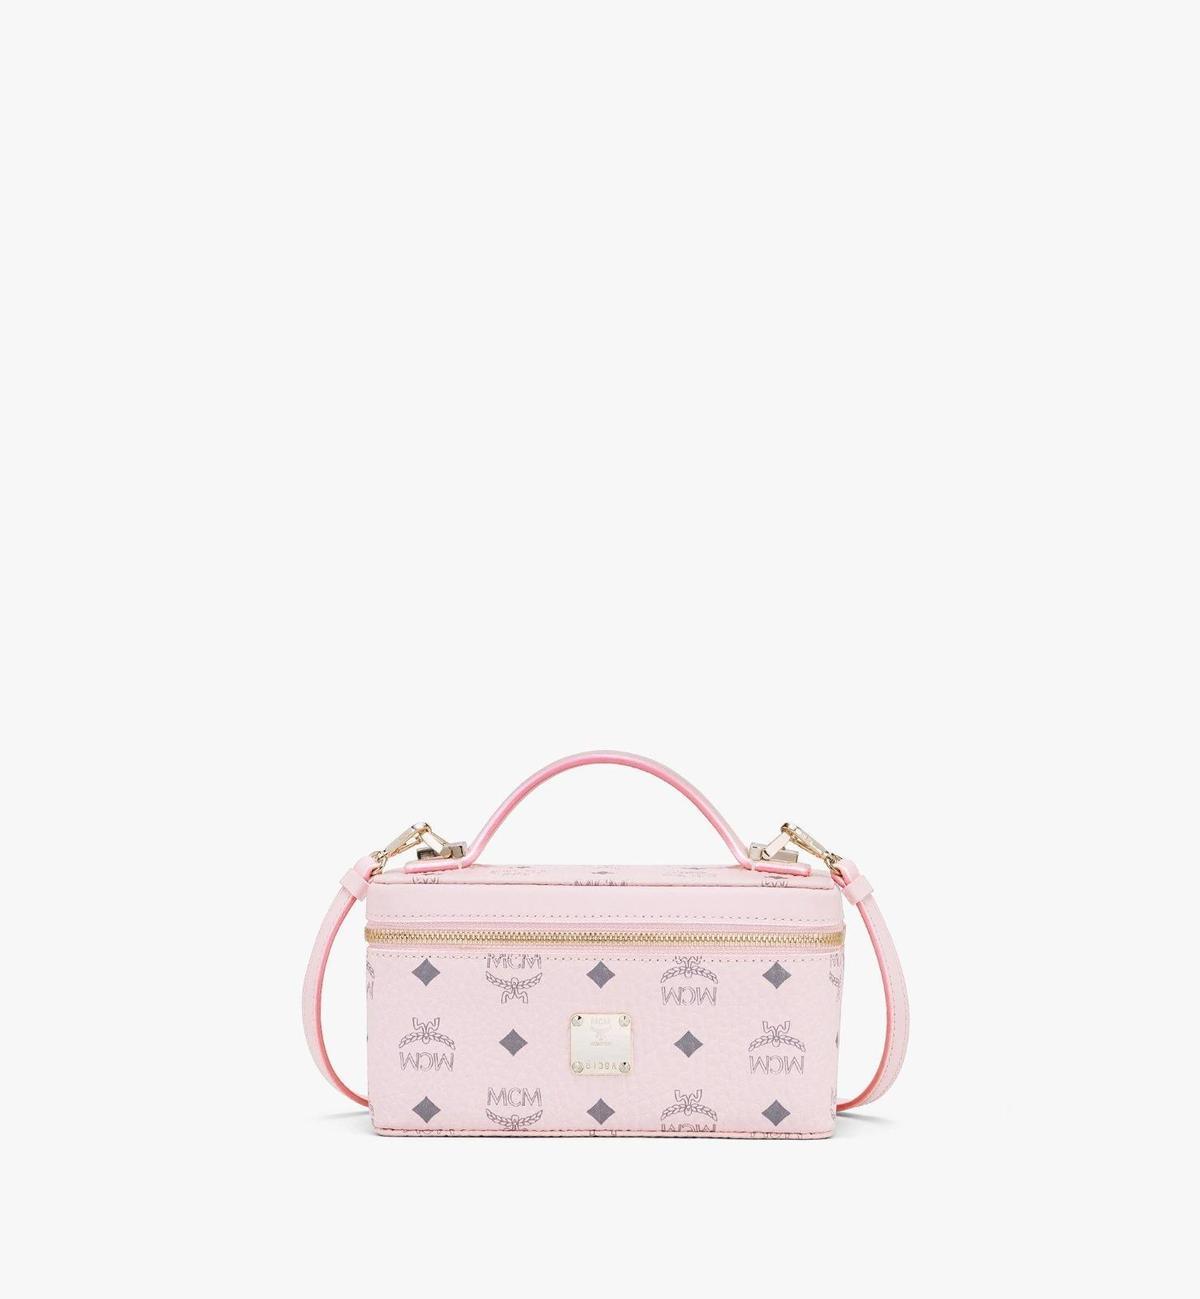 MCM Rockstar Visetos粉色箱型化妝包。NT$18,000(MCM提供)